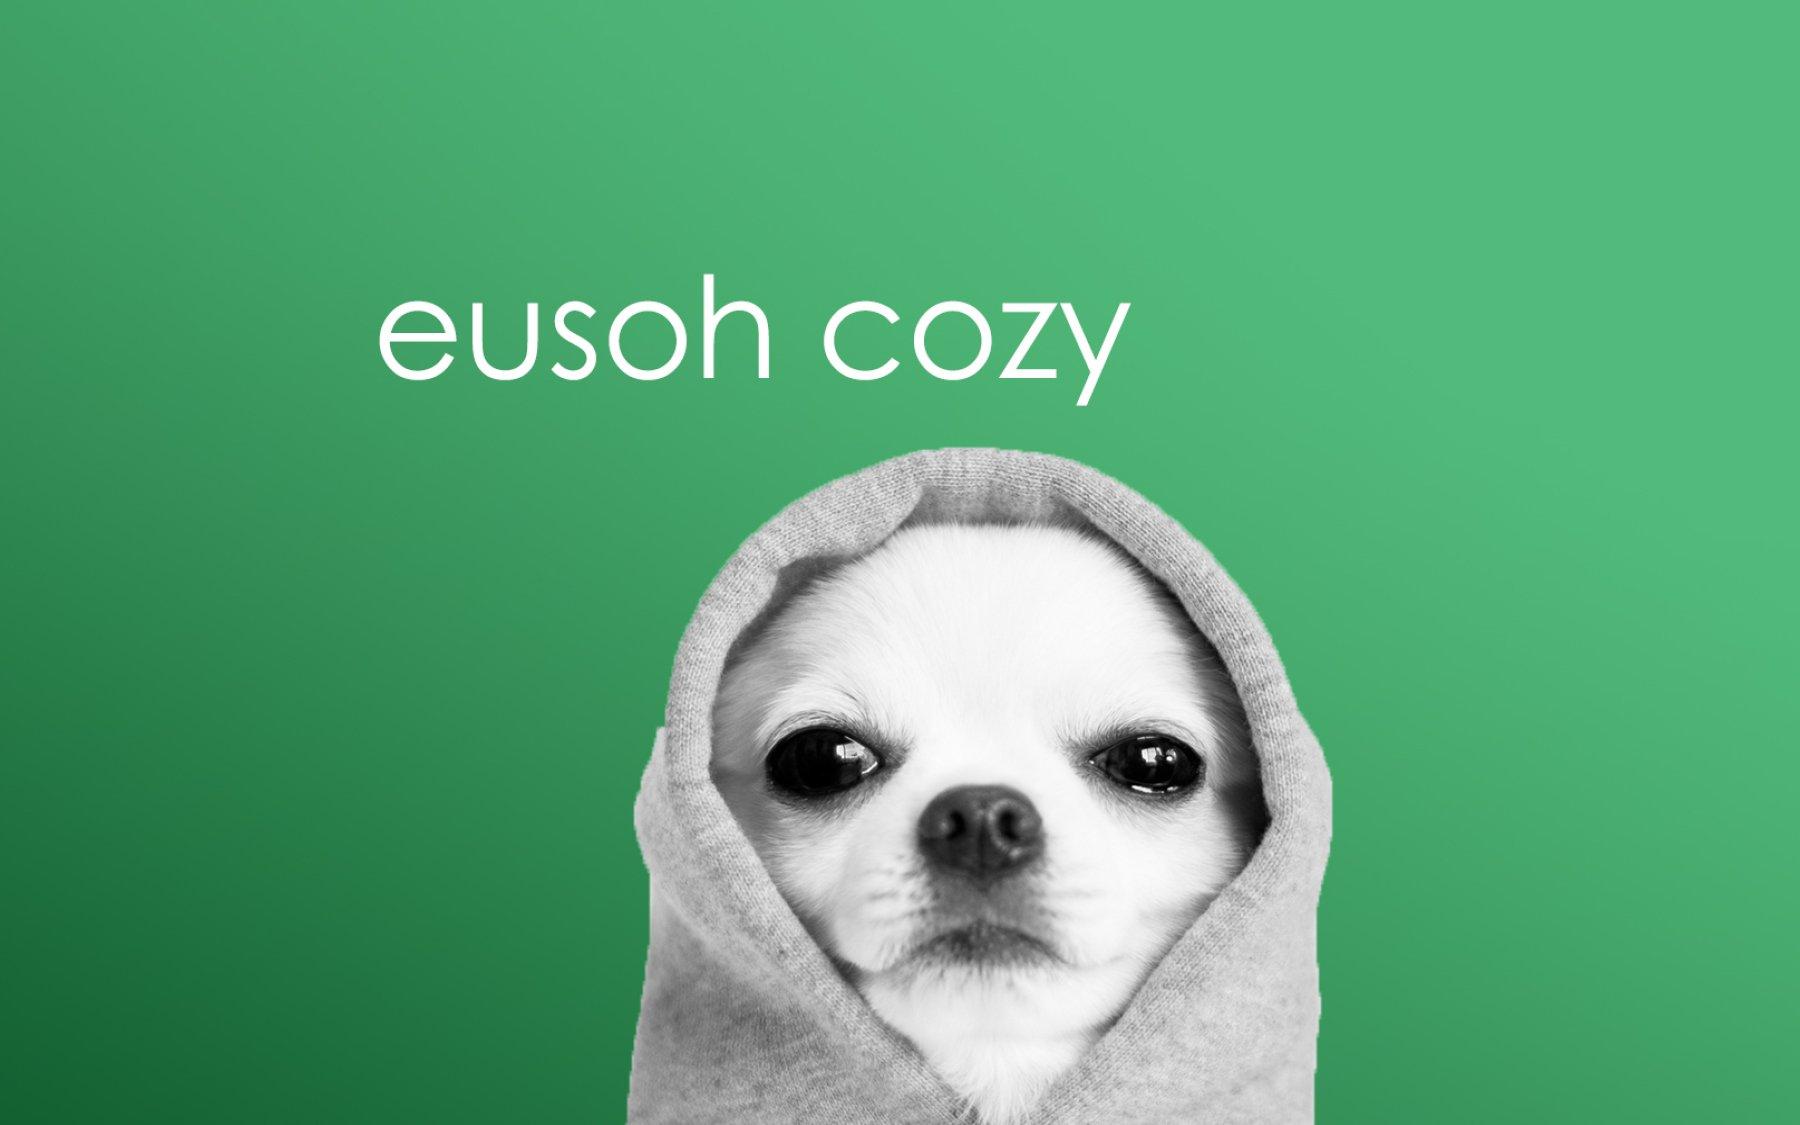 Eusoh close seed round